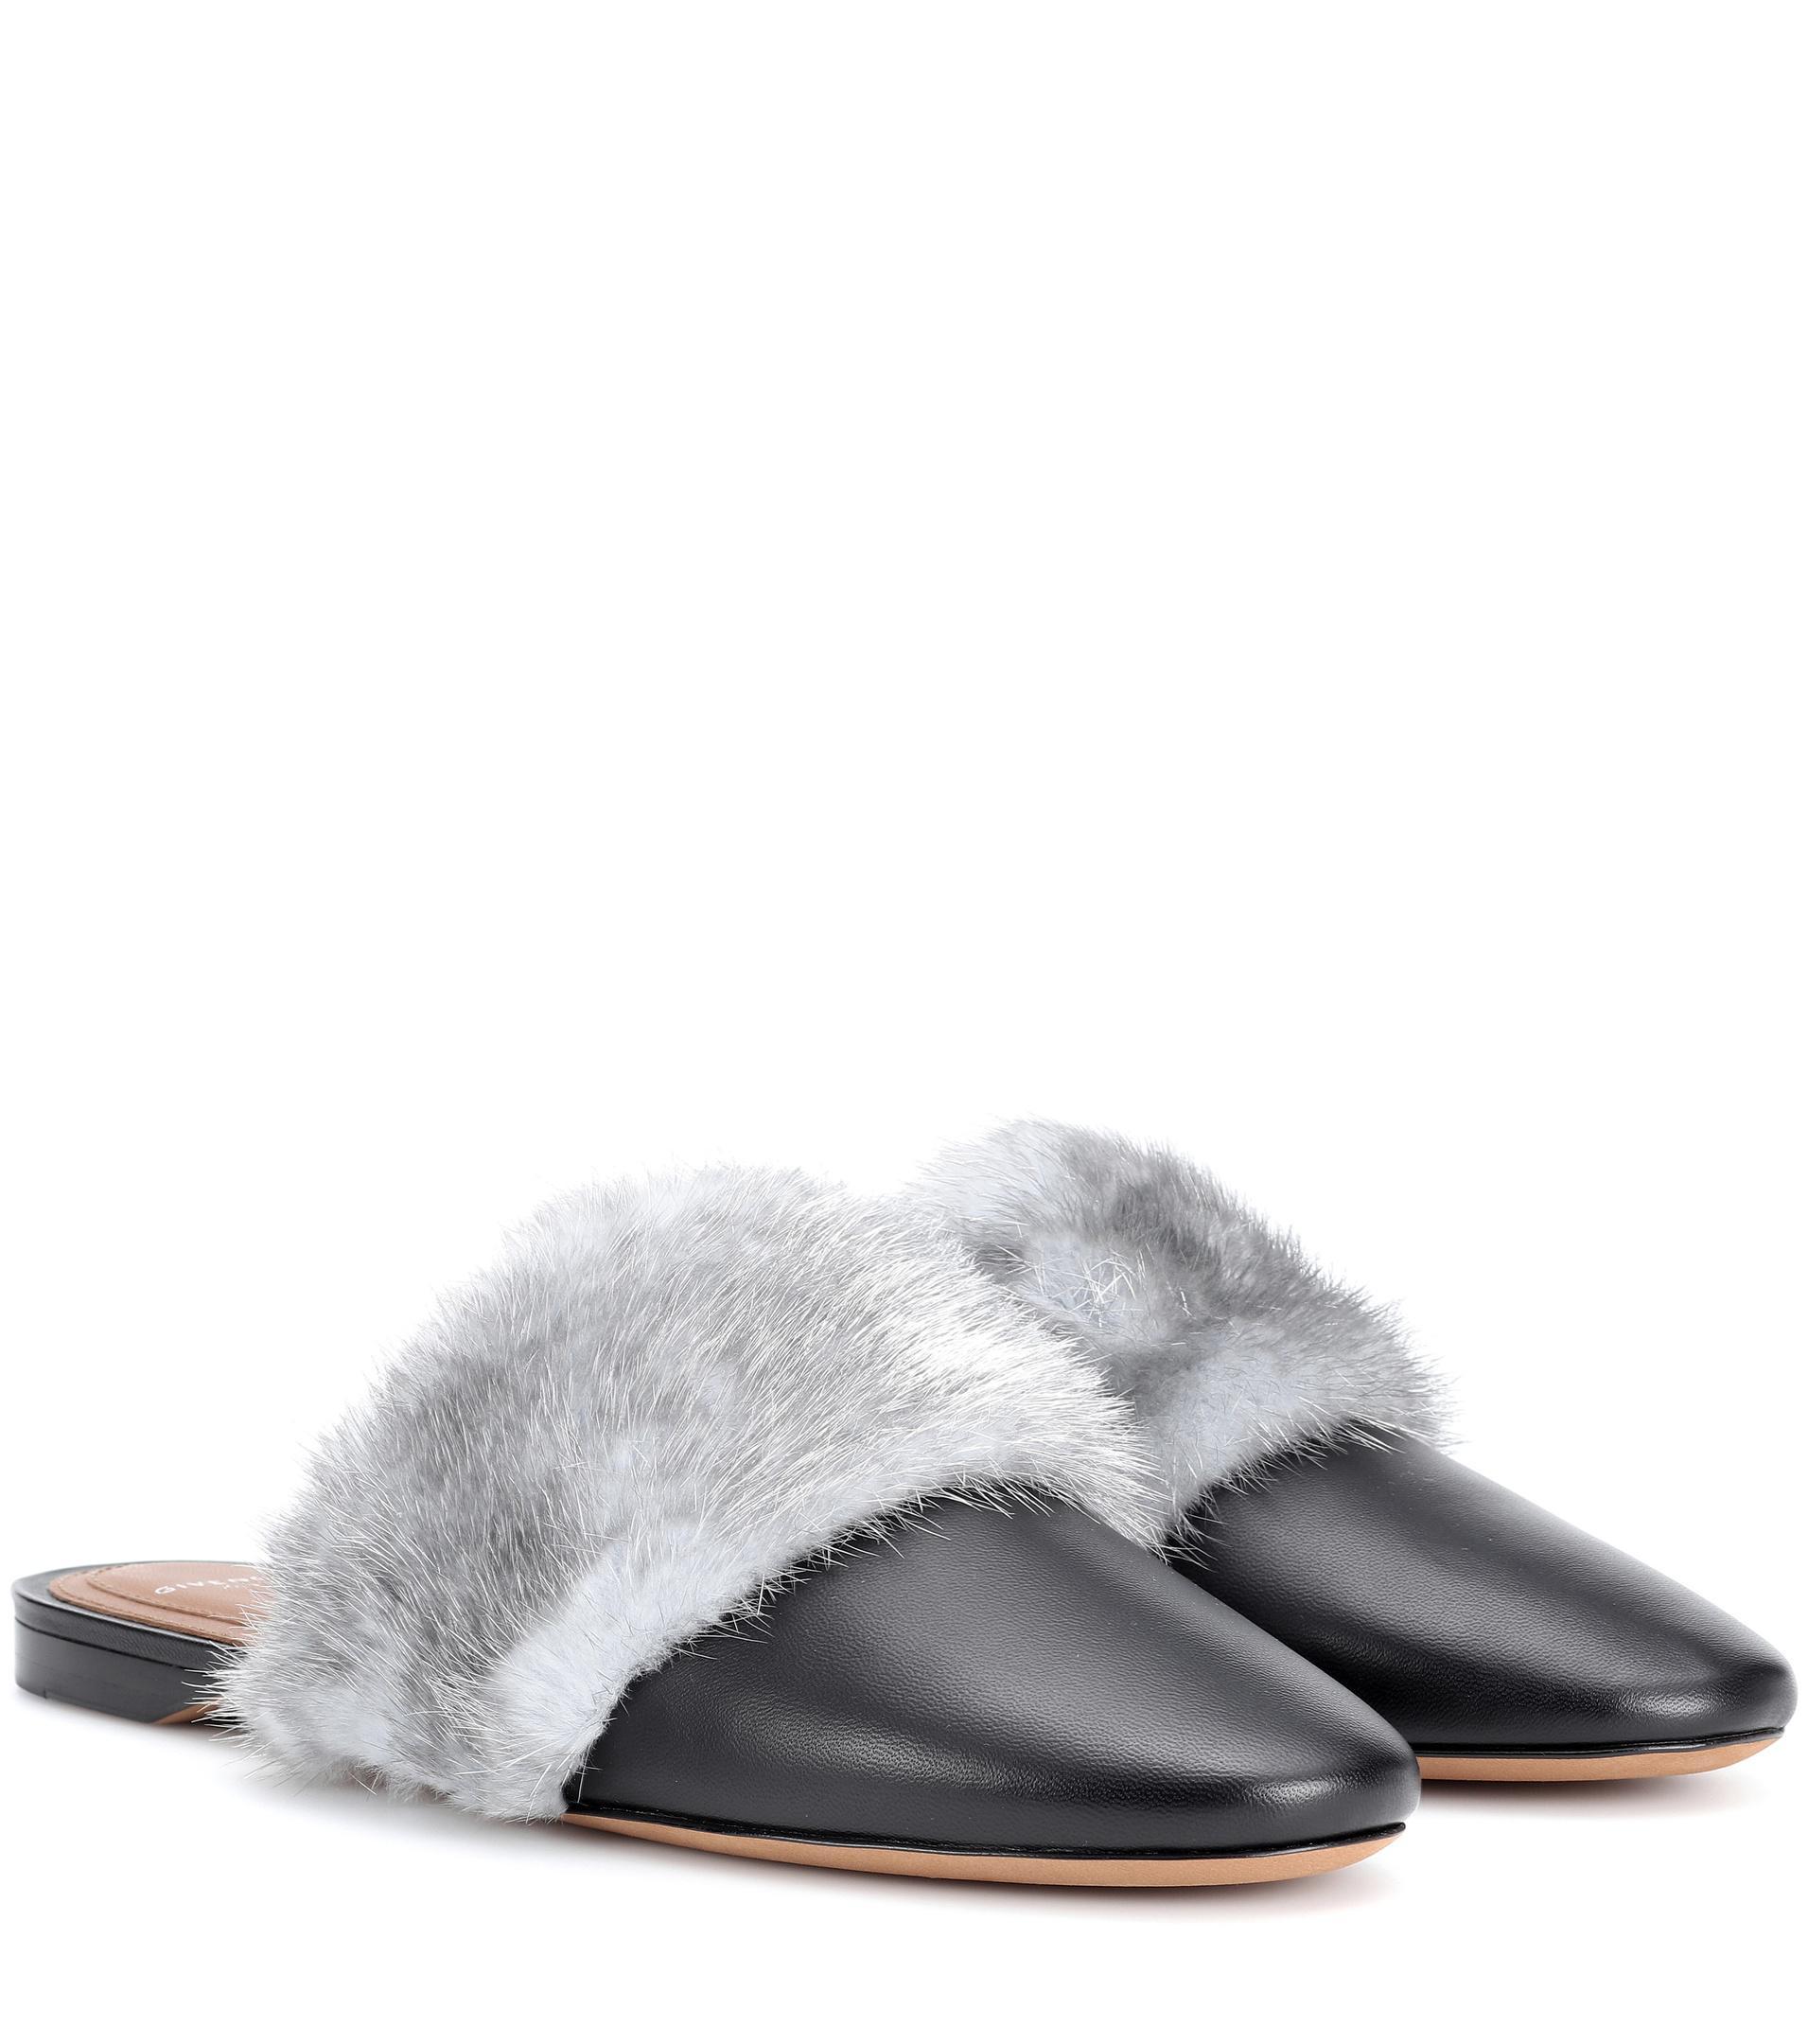 Bedford fur-trimmed leather slippers Givenchy WWzUTVBG4